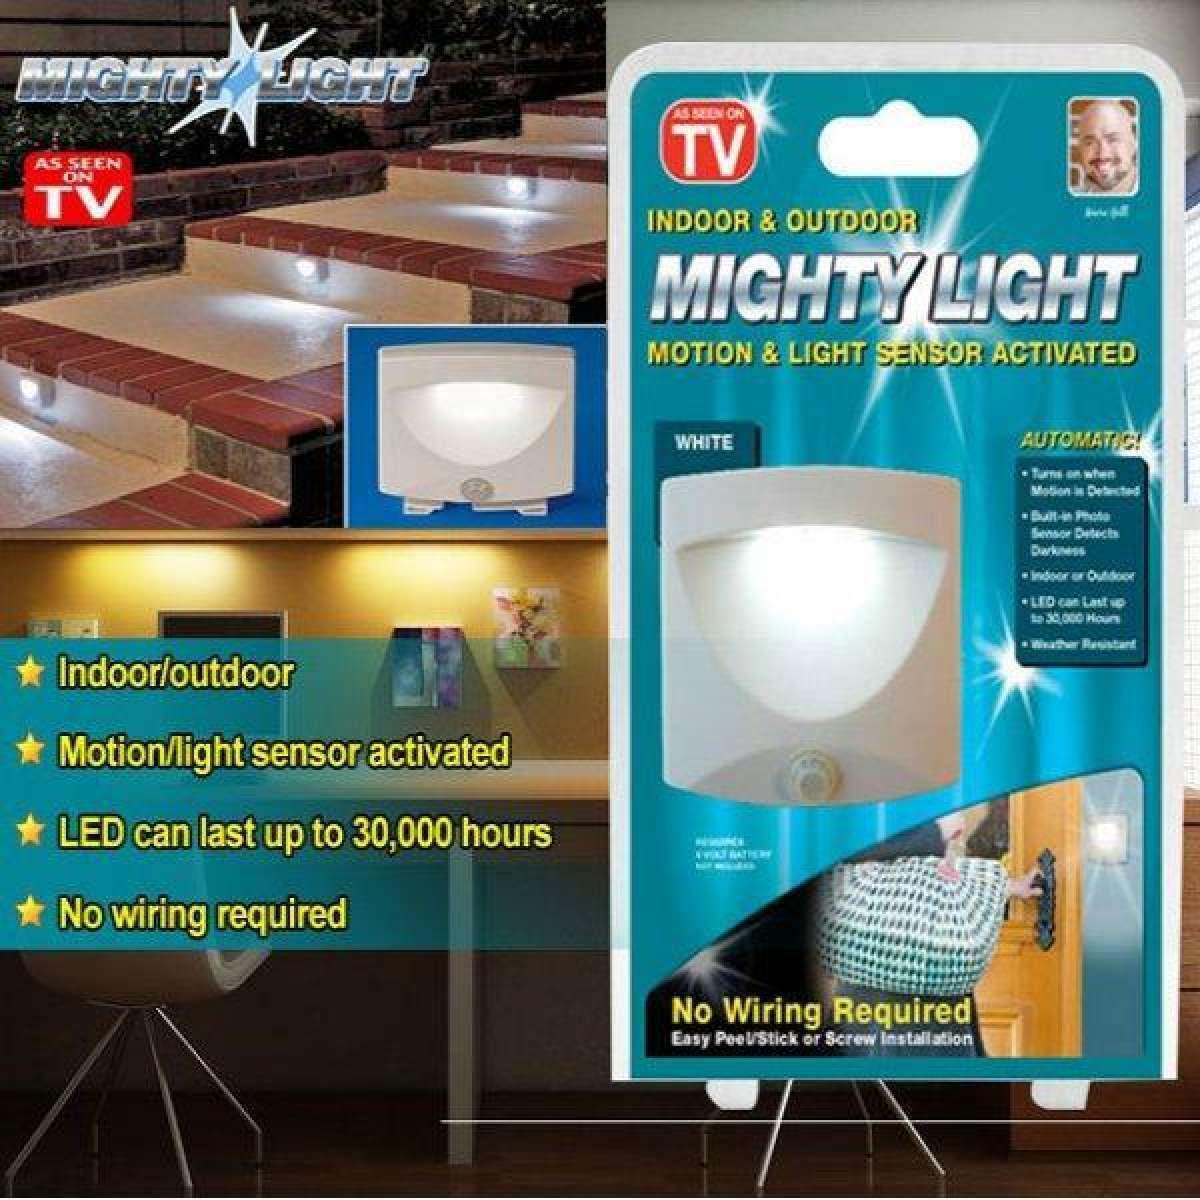 MIGHTY LIGHT INDOOR & OUTDOOR MOTION & SENSOR ACTIVATED